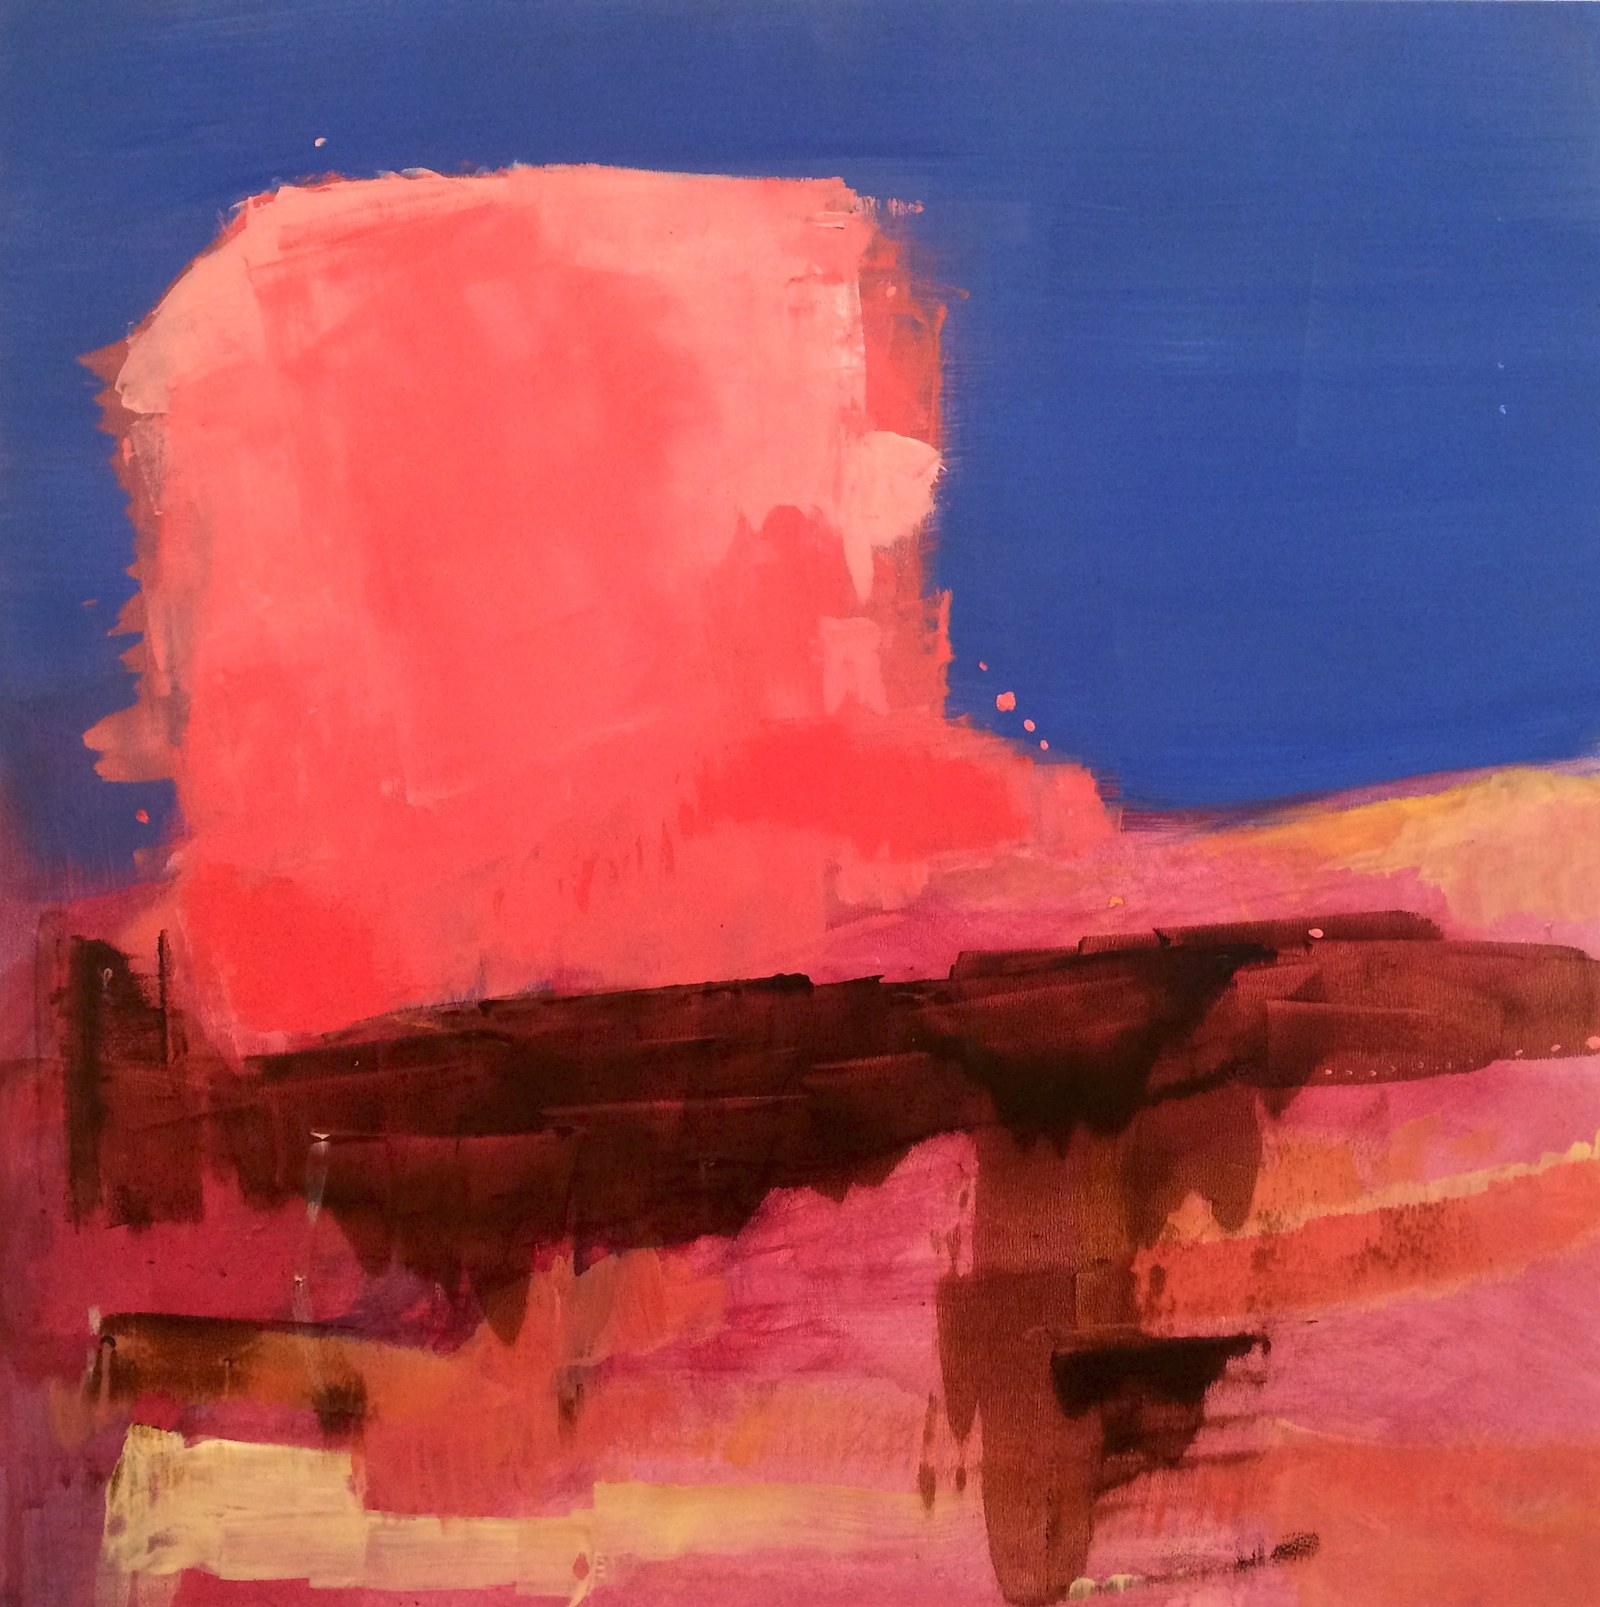 how time feels (sanguine), 40 x 40 cm, 2016, Jane Hughes